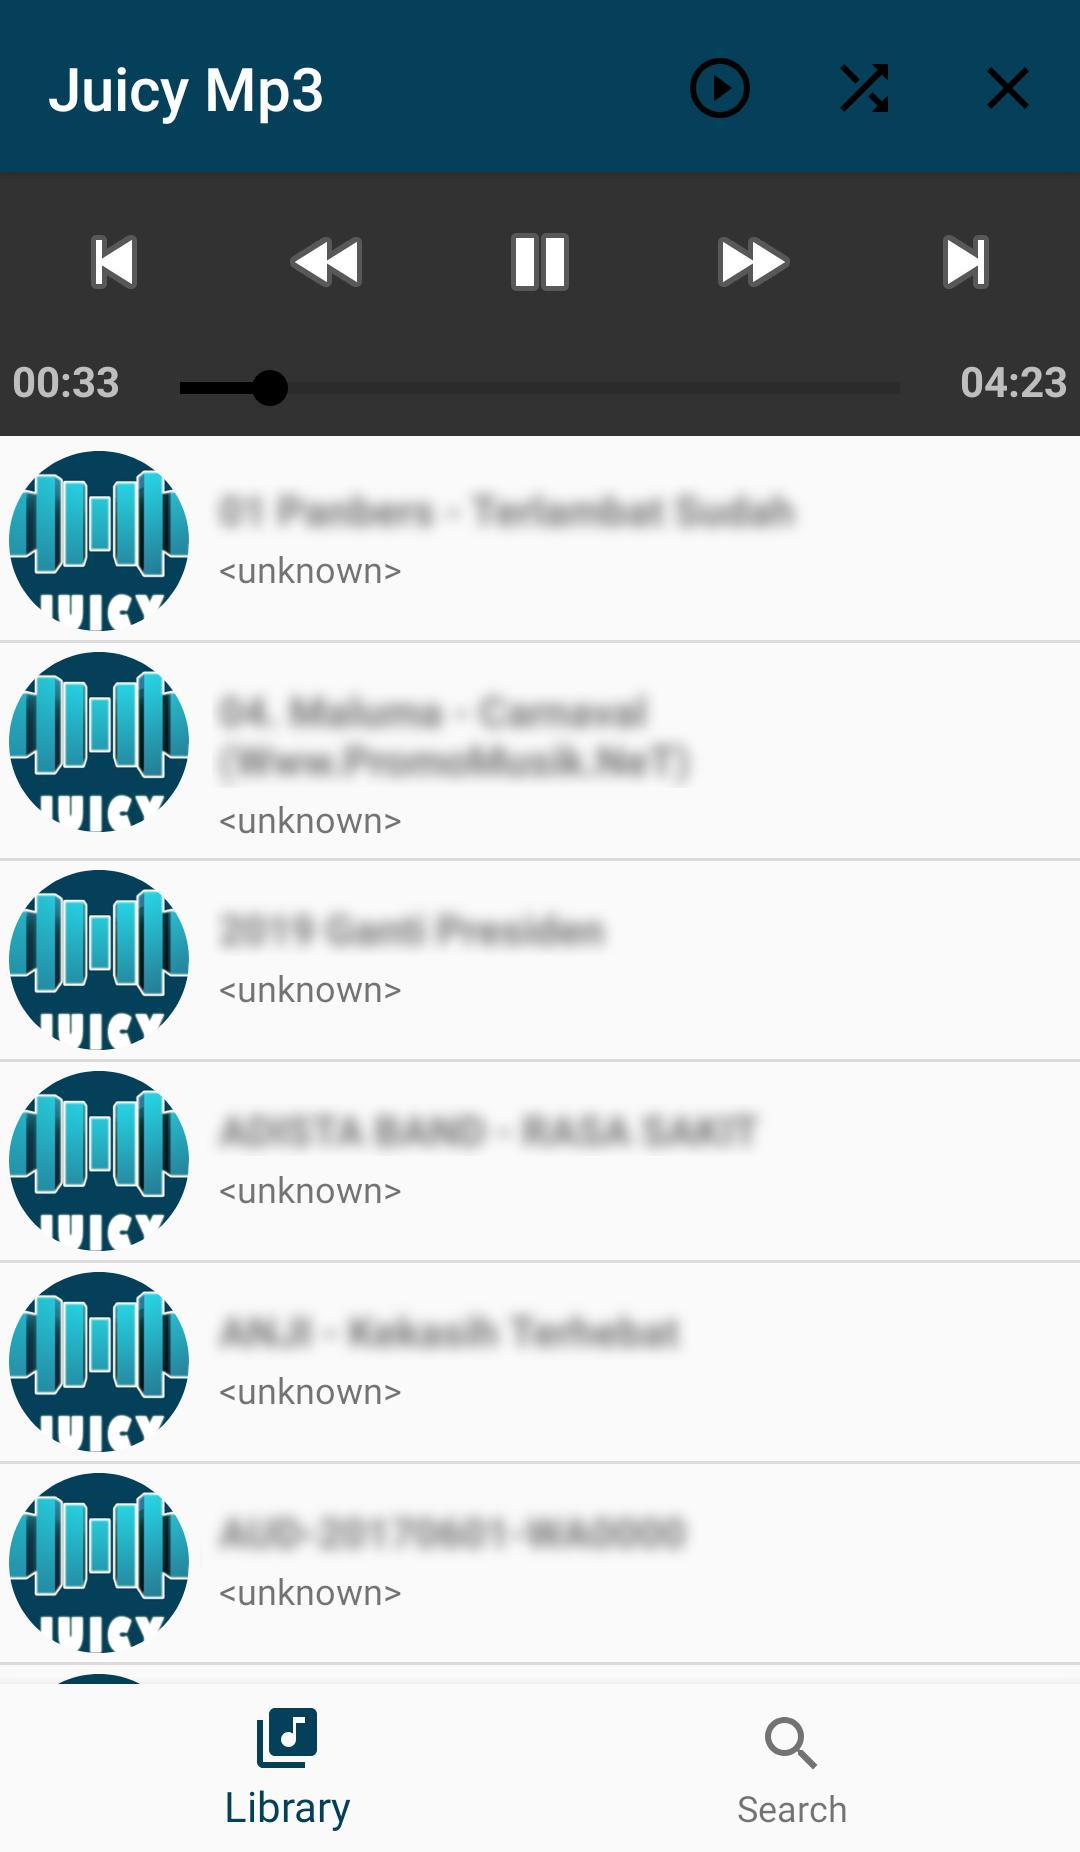 Mp3Juice Download: / Juice Mp3 Download – POPVERGE